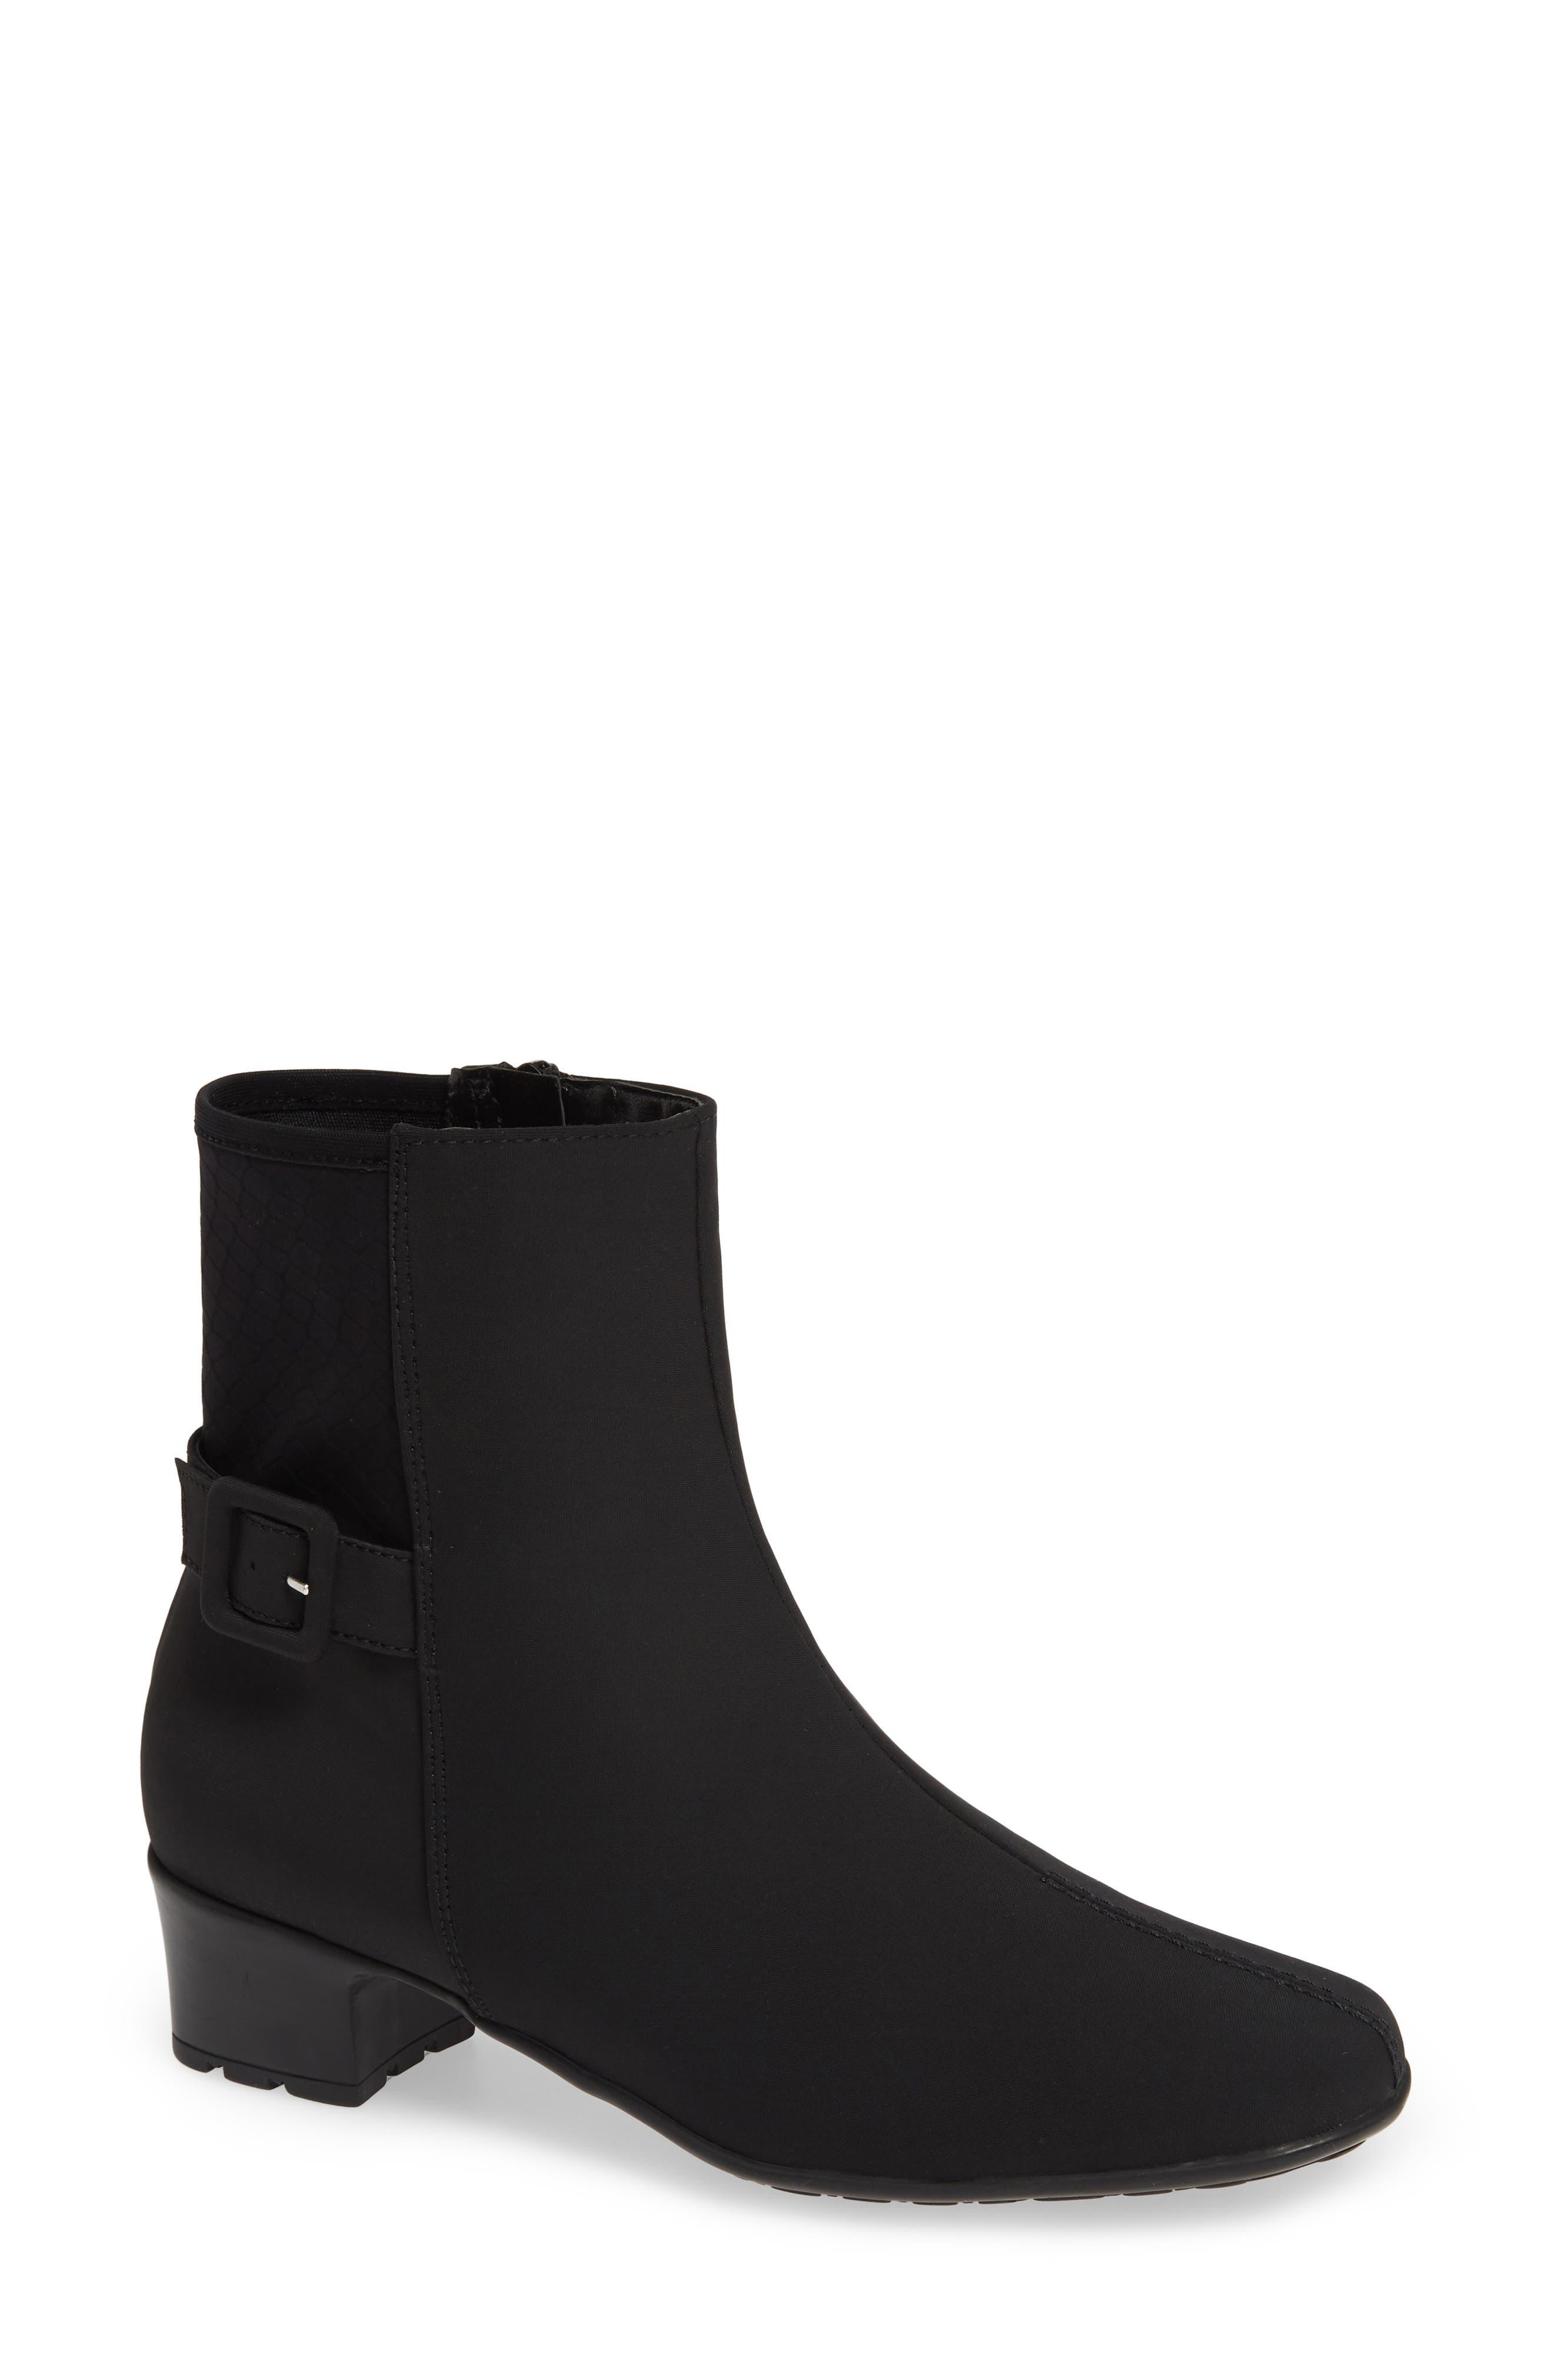 SESTO MEUCCI Ylva Waterproof Buckle Bootie in Black Fabric